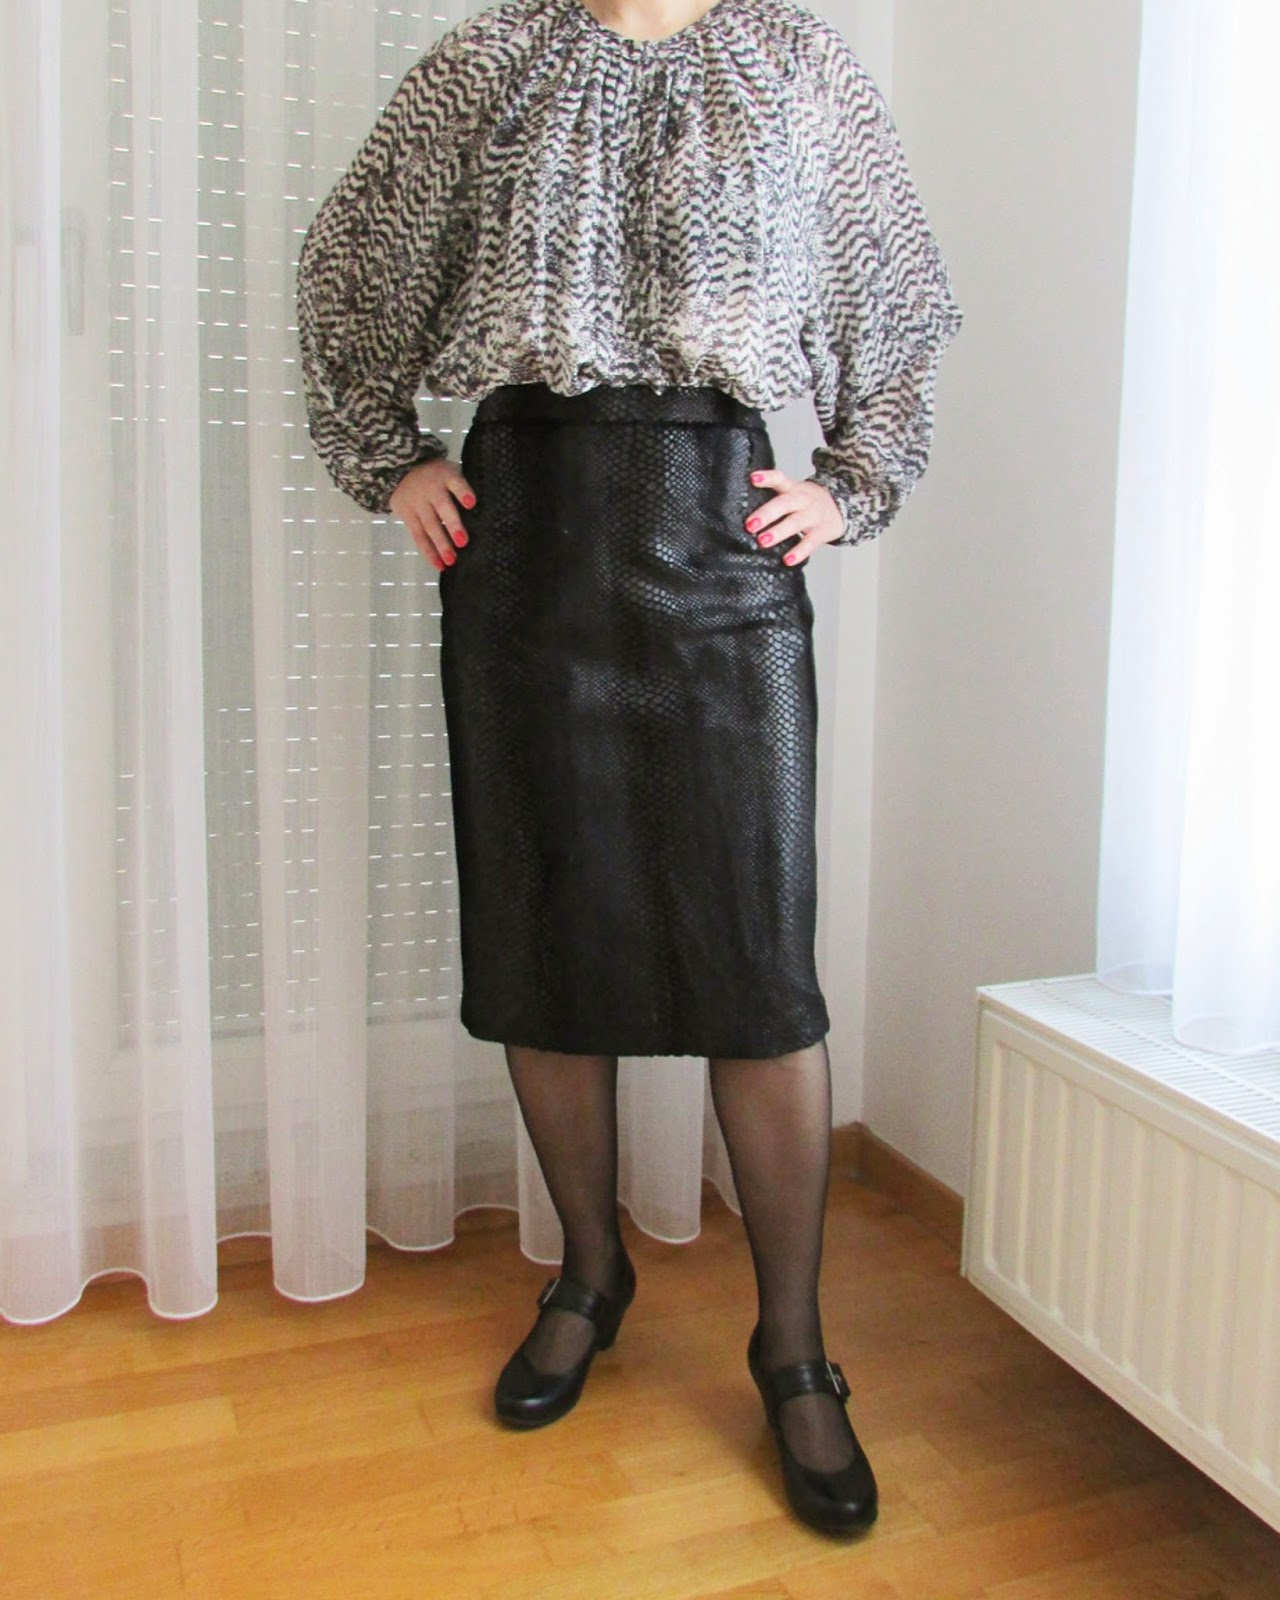 http://ladylinaland.blogspot.com/2014/03/faux-snakeskin-pencil-skirt.html